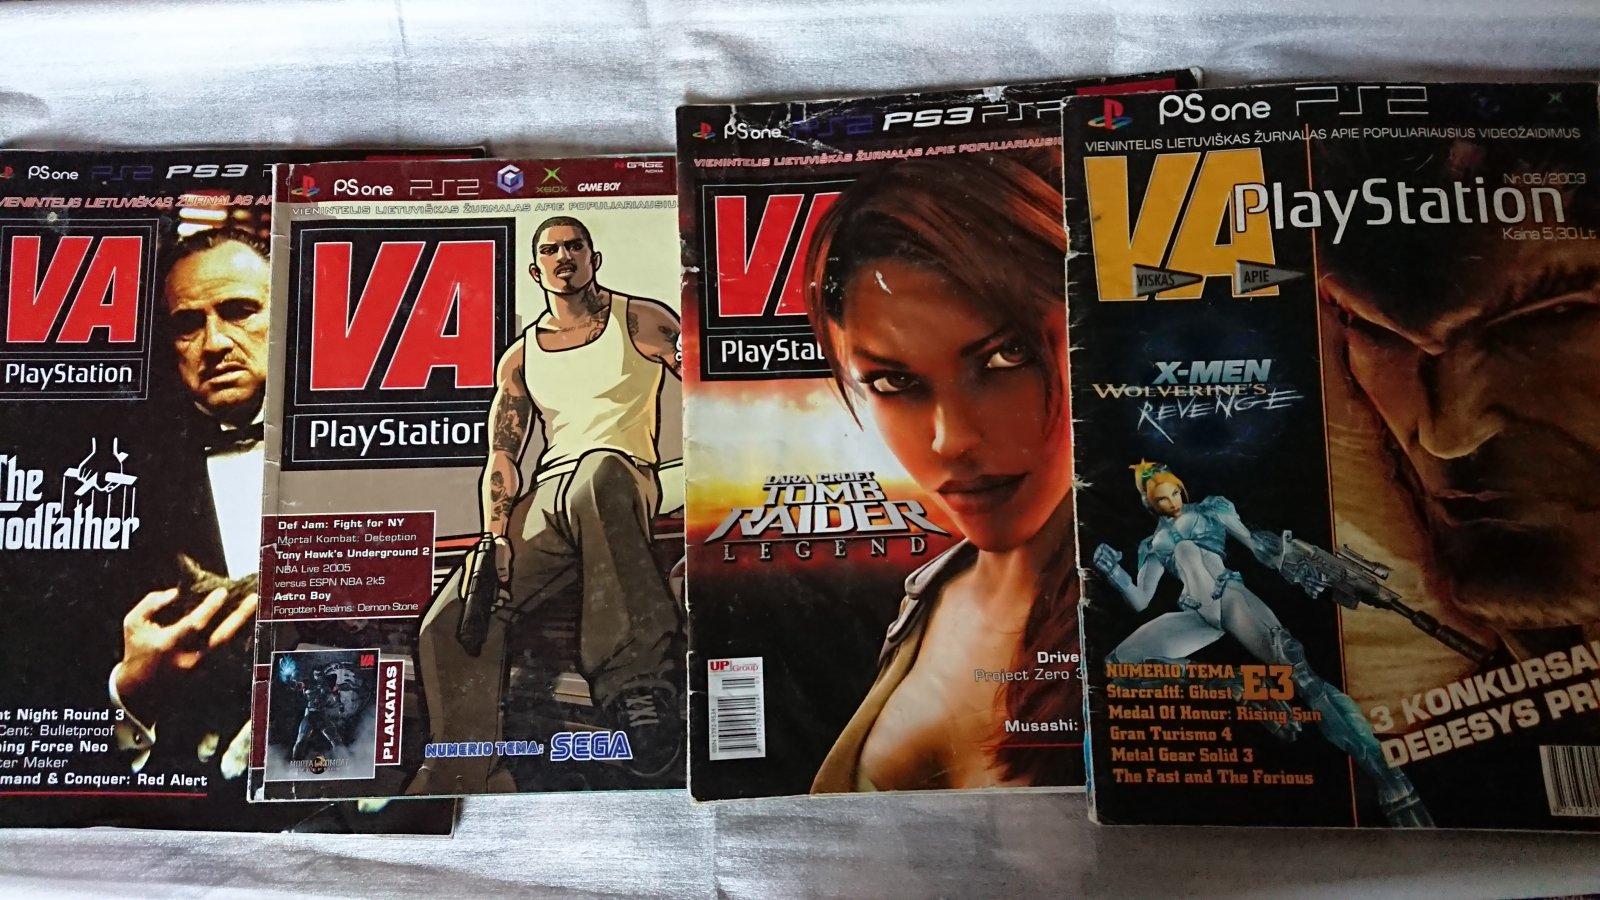 V.A. PlayStation žurnalai